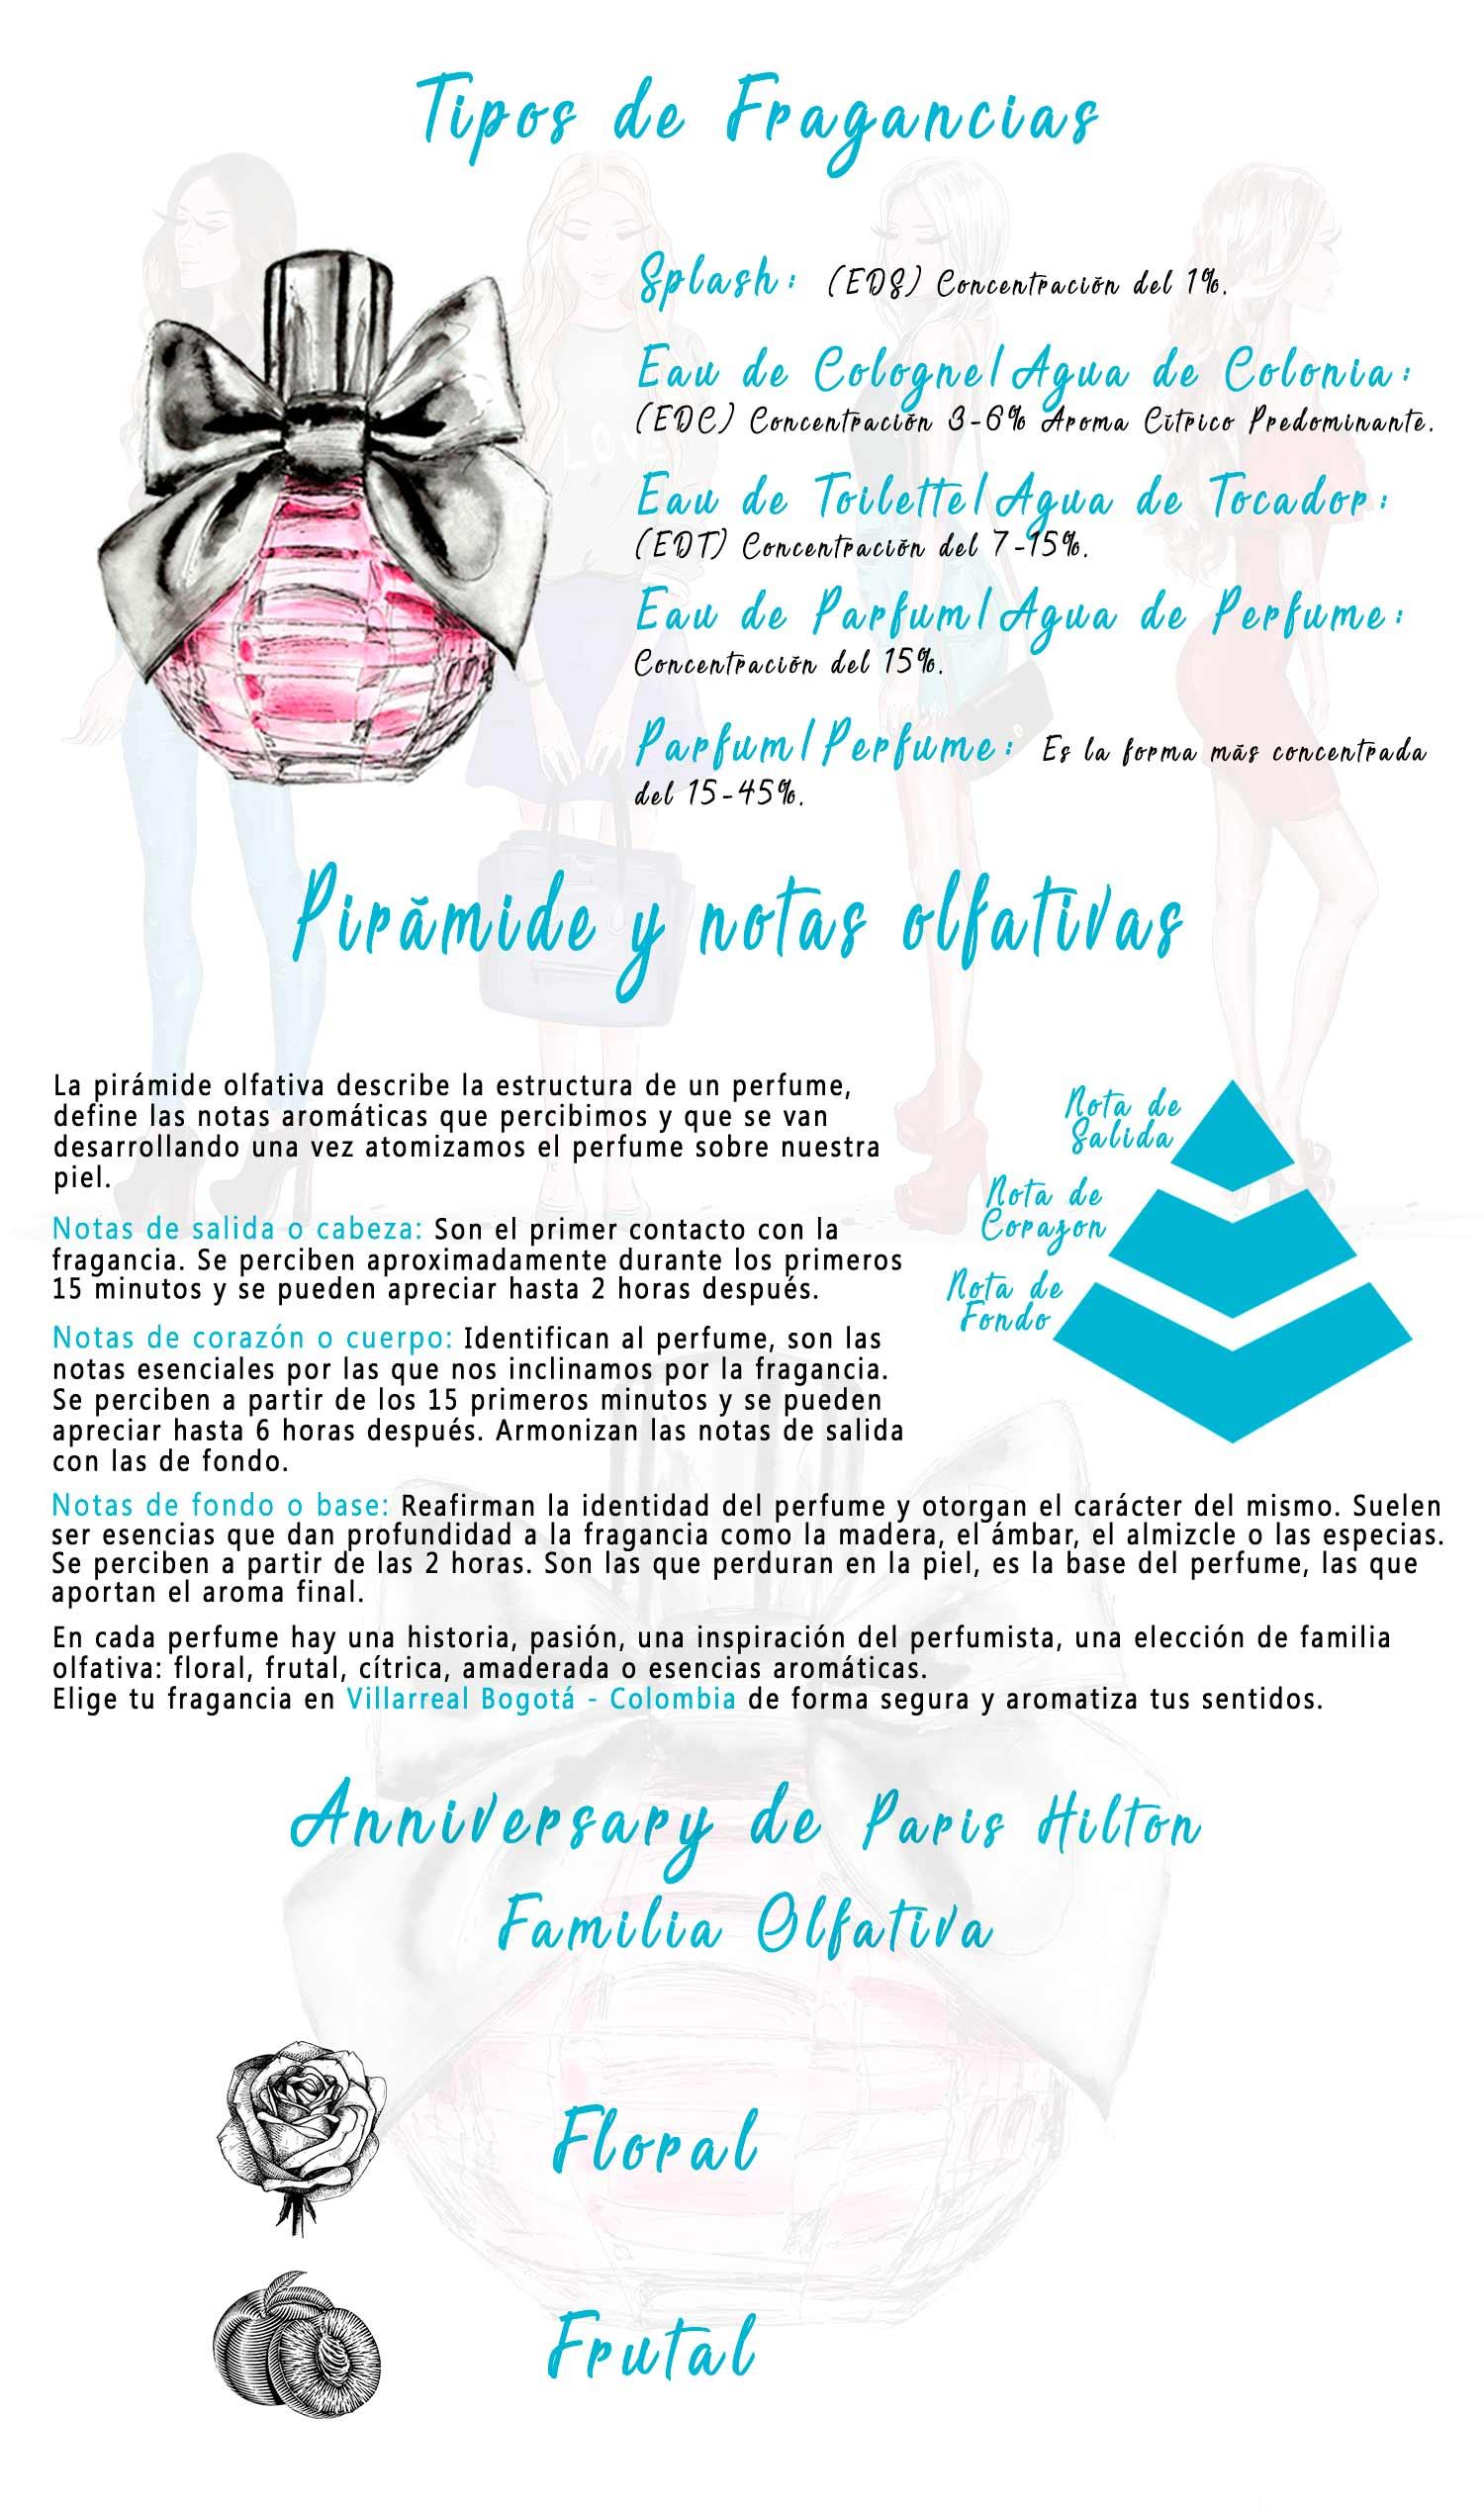 descripción anniversary paris hilton